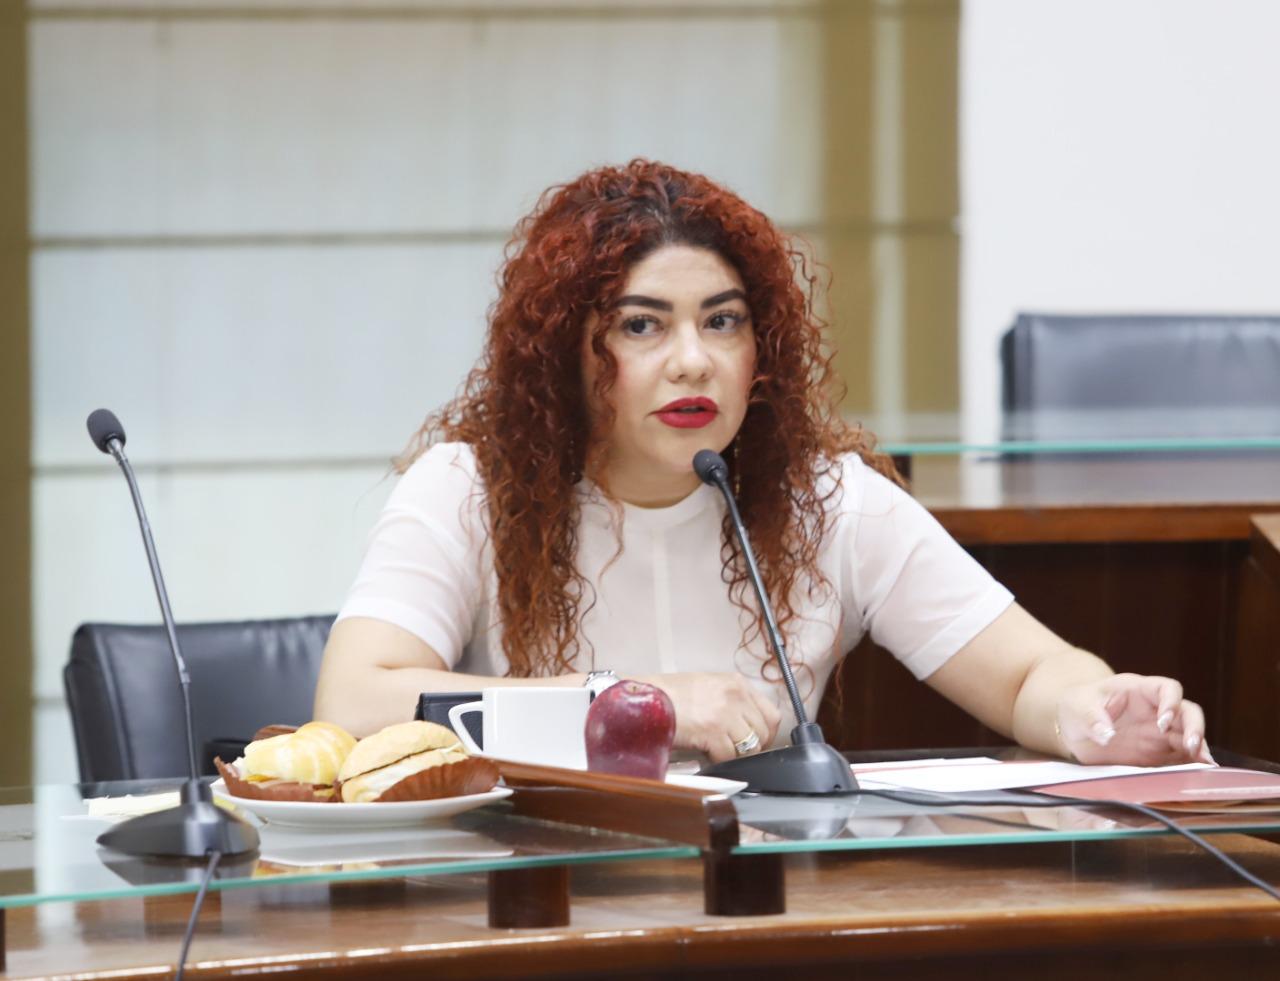 Acusan a Lorena Salas, síndica de Ecatepec, de fraude por 25 mil pesos; enfrenta juicio penal